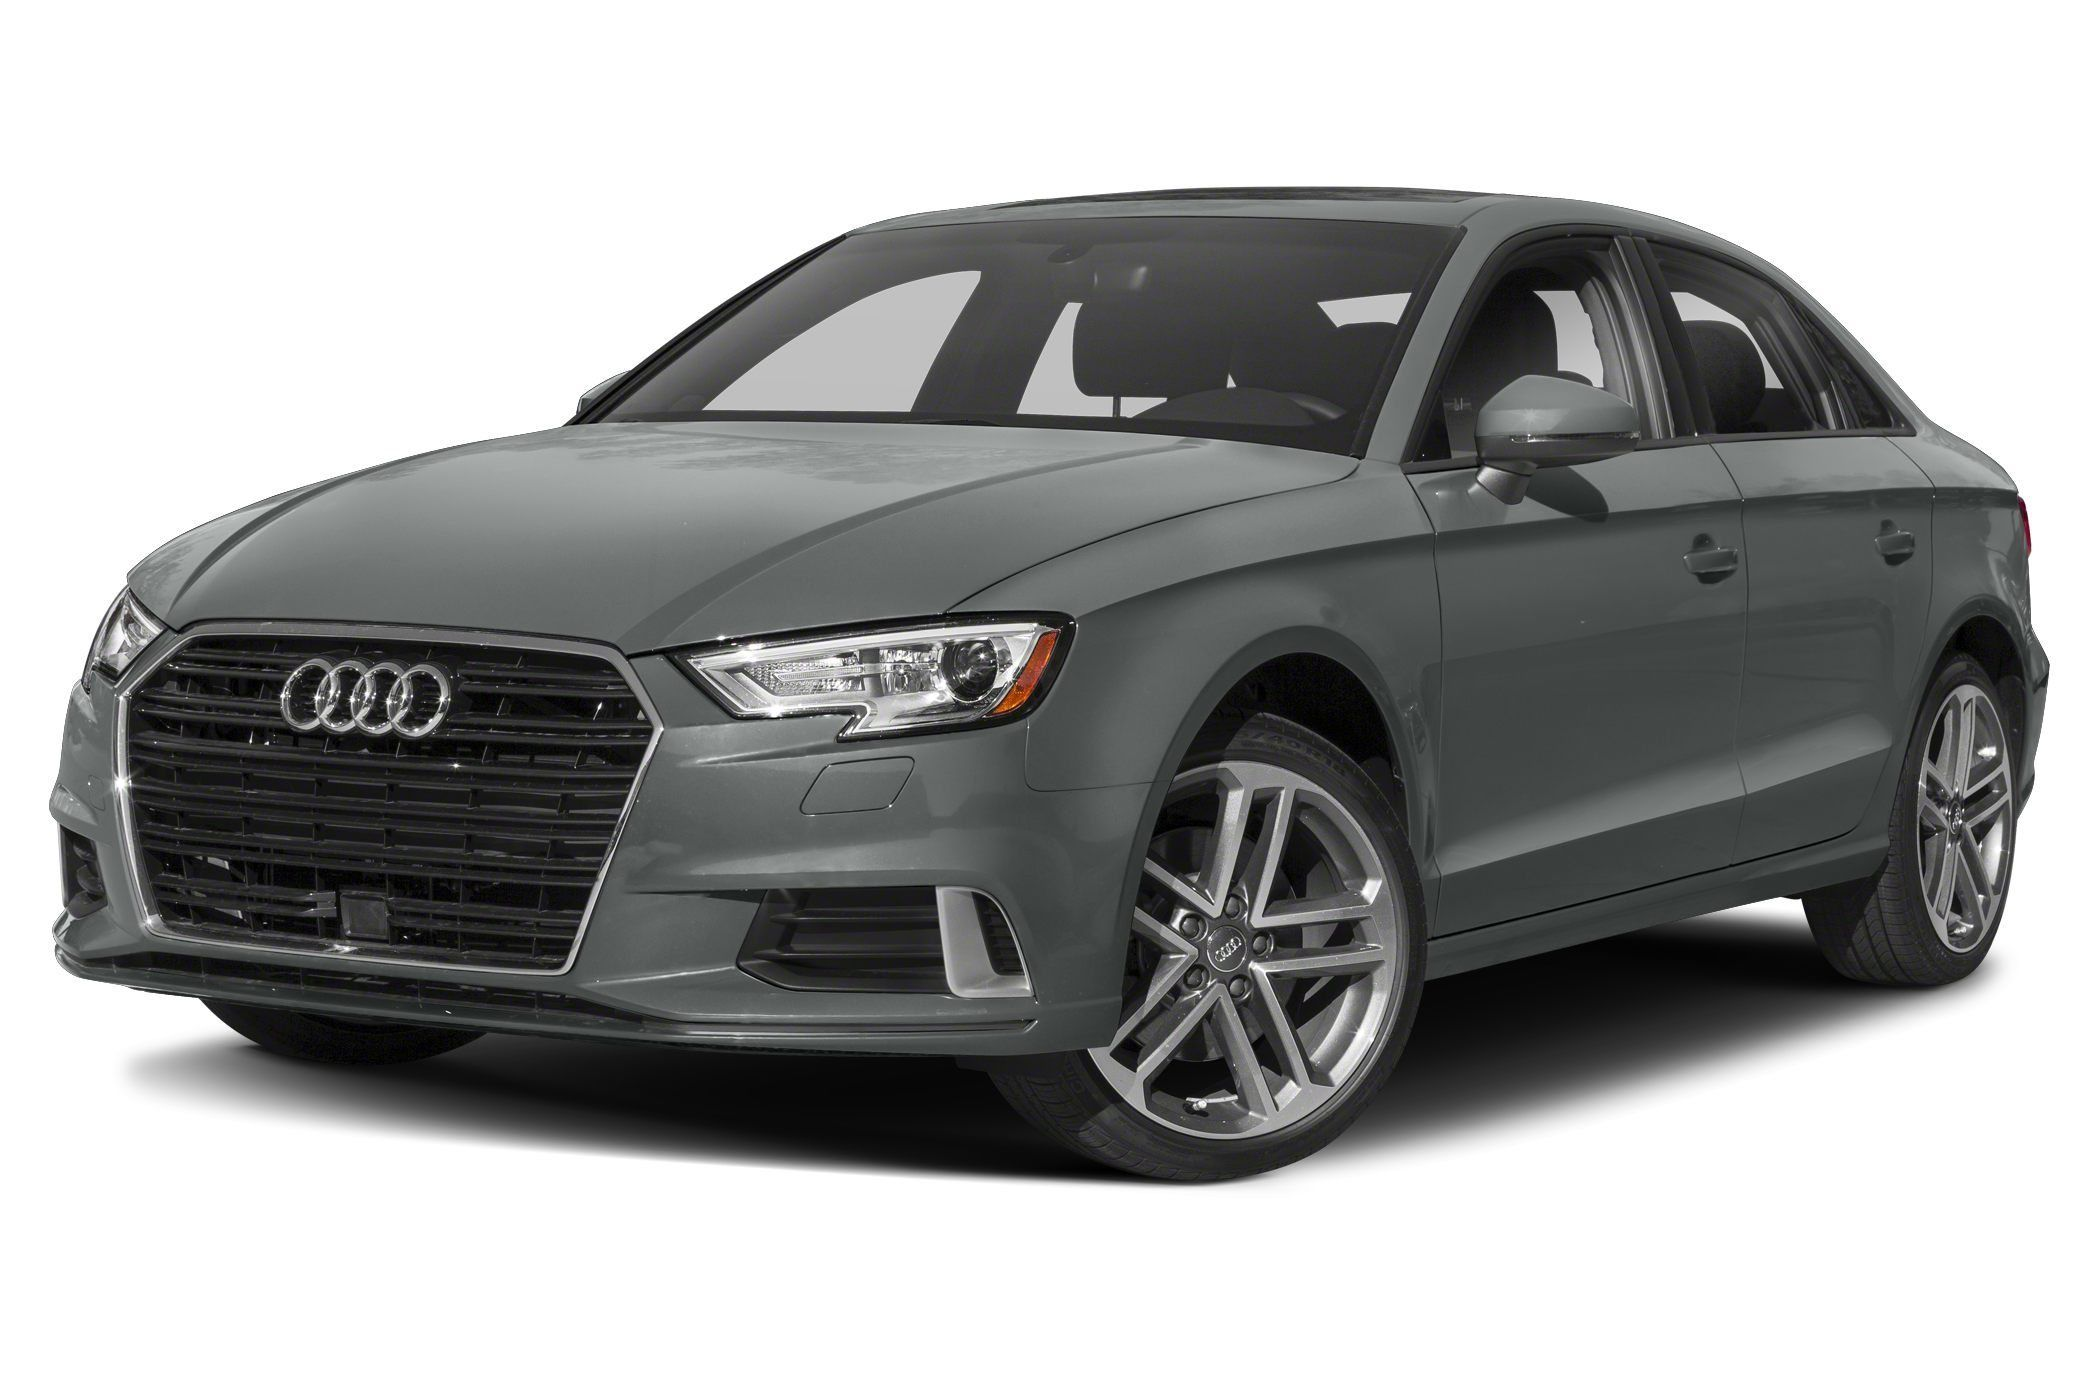 2021 Audi Q6 Spy Shoot in 2020 Audi, Audi a3 sedan, Audi